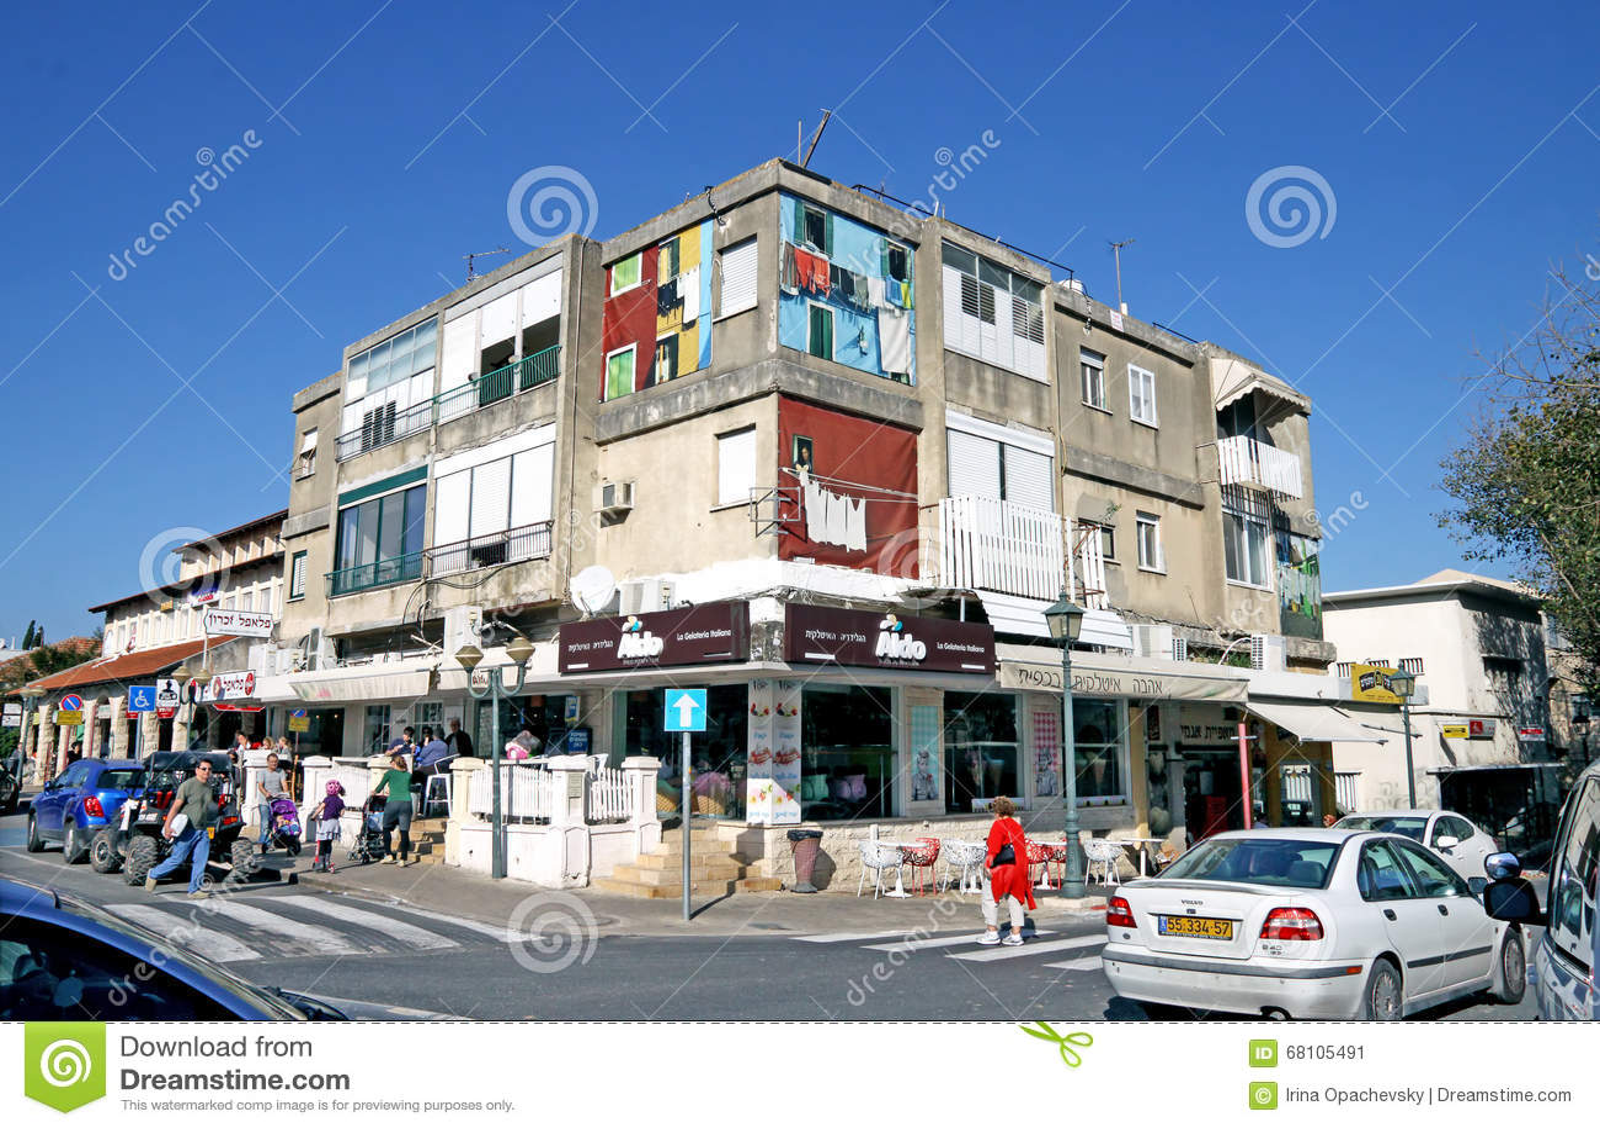 Zichron Yaakov Israel  city images : ZICHRON YAAKOV, ISRAEL FEBRUAR 28, 2016: Artistically decorated ...